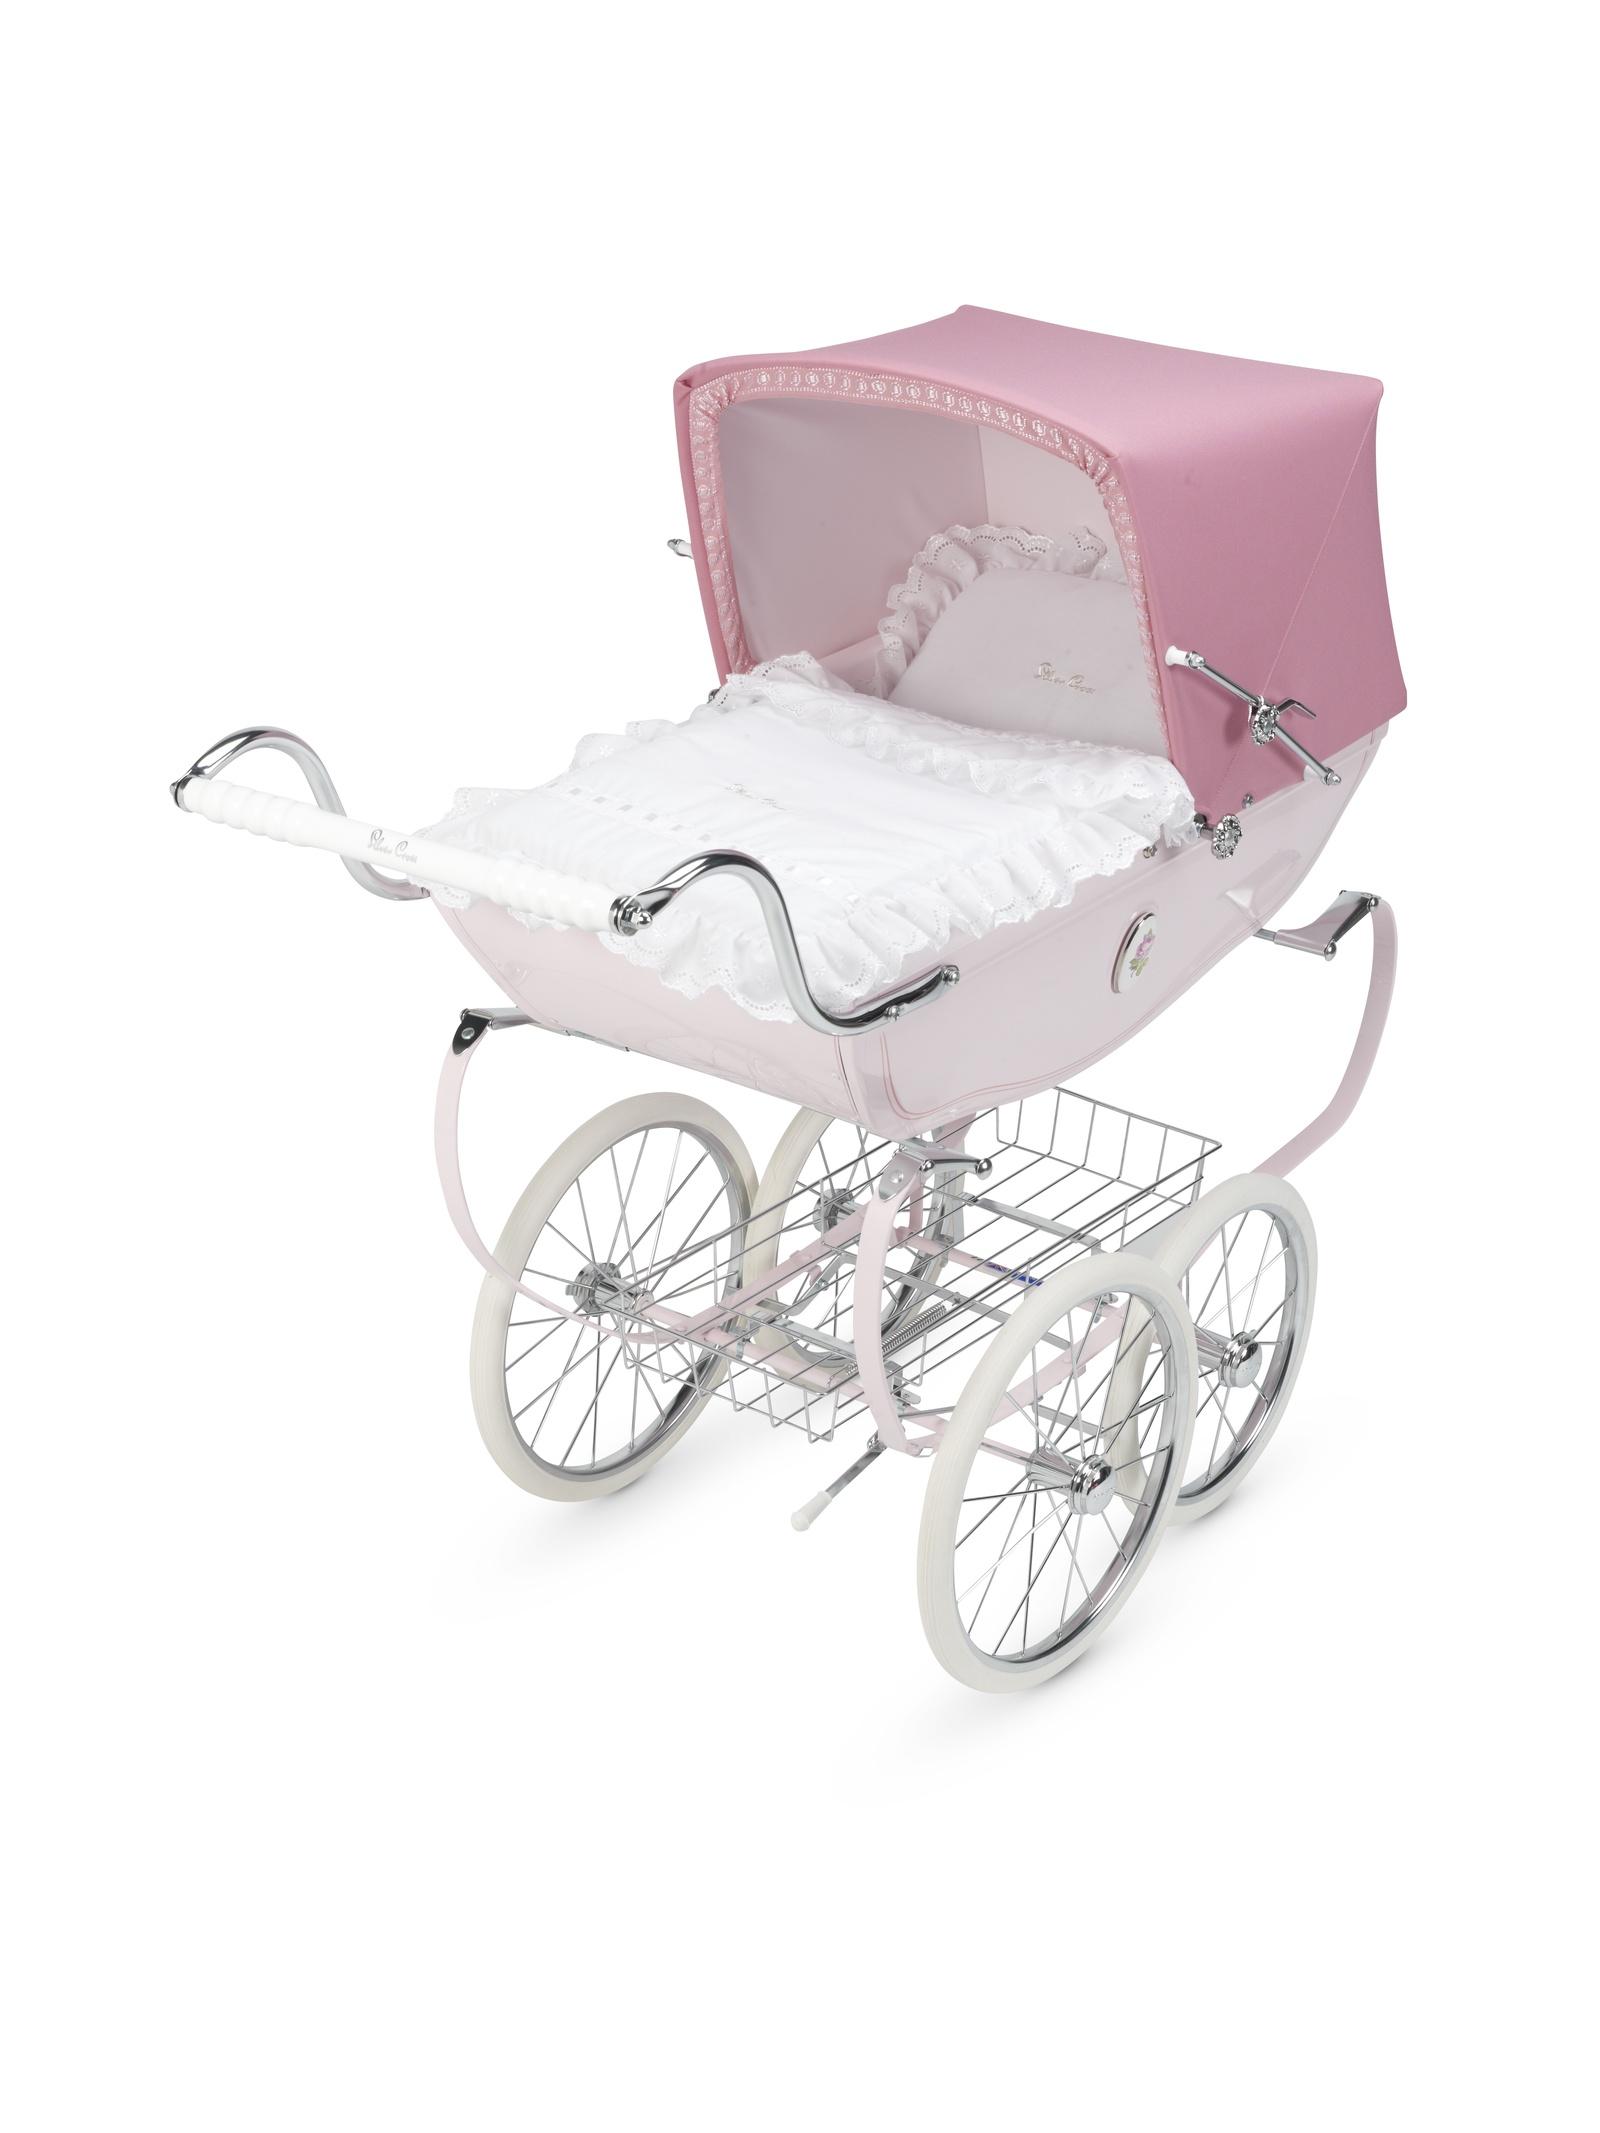 Транспорт для кукол Silver Cross SX6069.00 розовый цена 2017